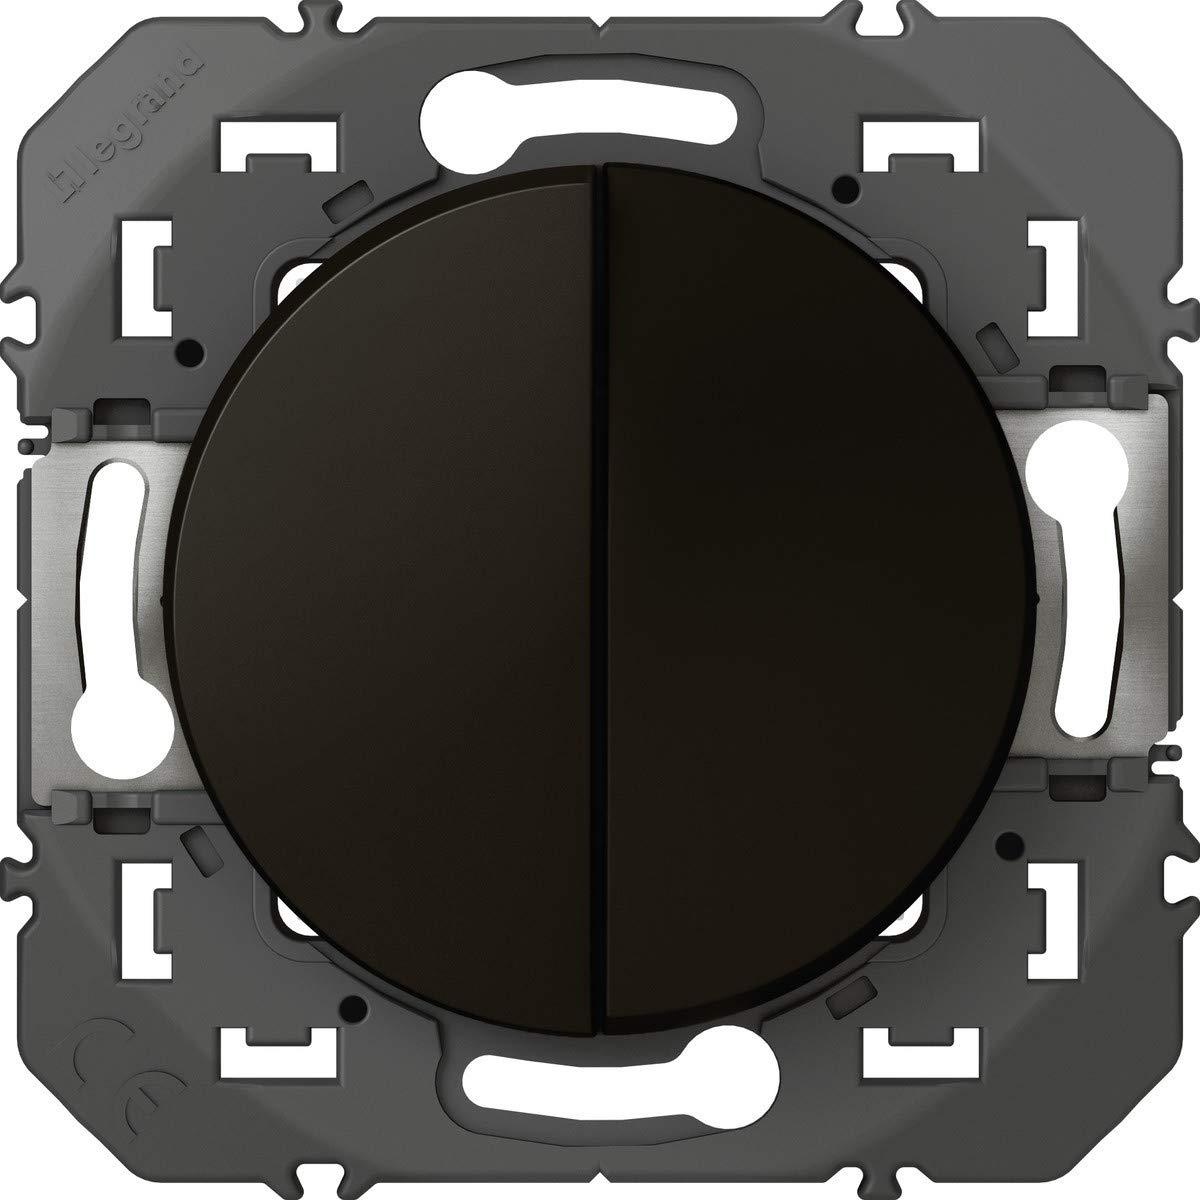 Legrand leg95260/doble VV Interruptor o interruptor conmutado dooxie 10/AX 250/V ~ acabado noir-emballage Blister